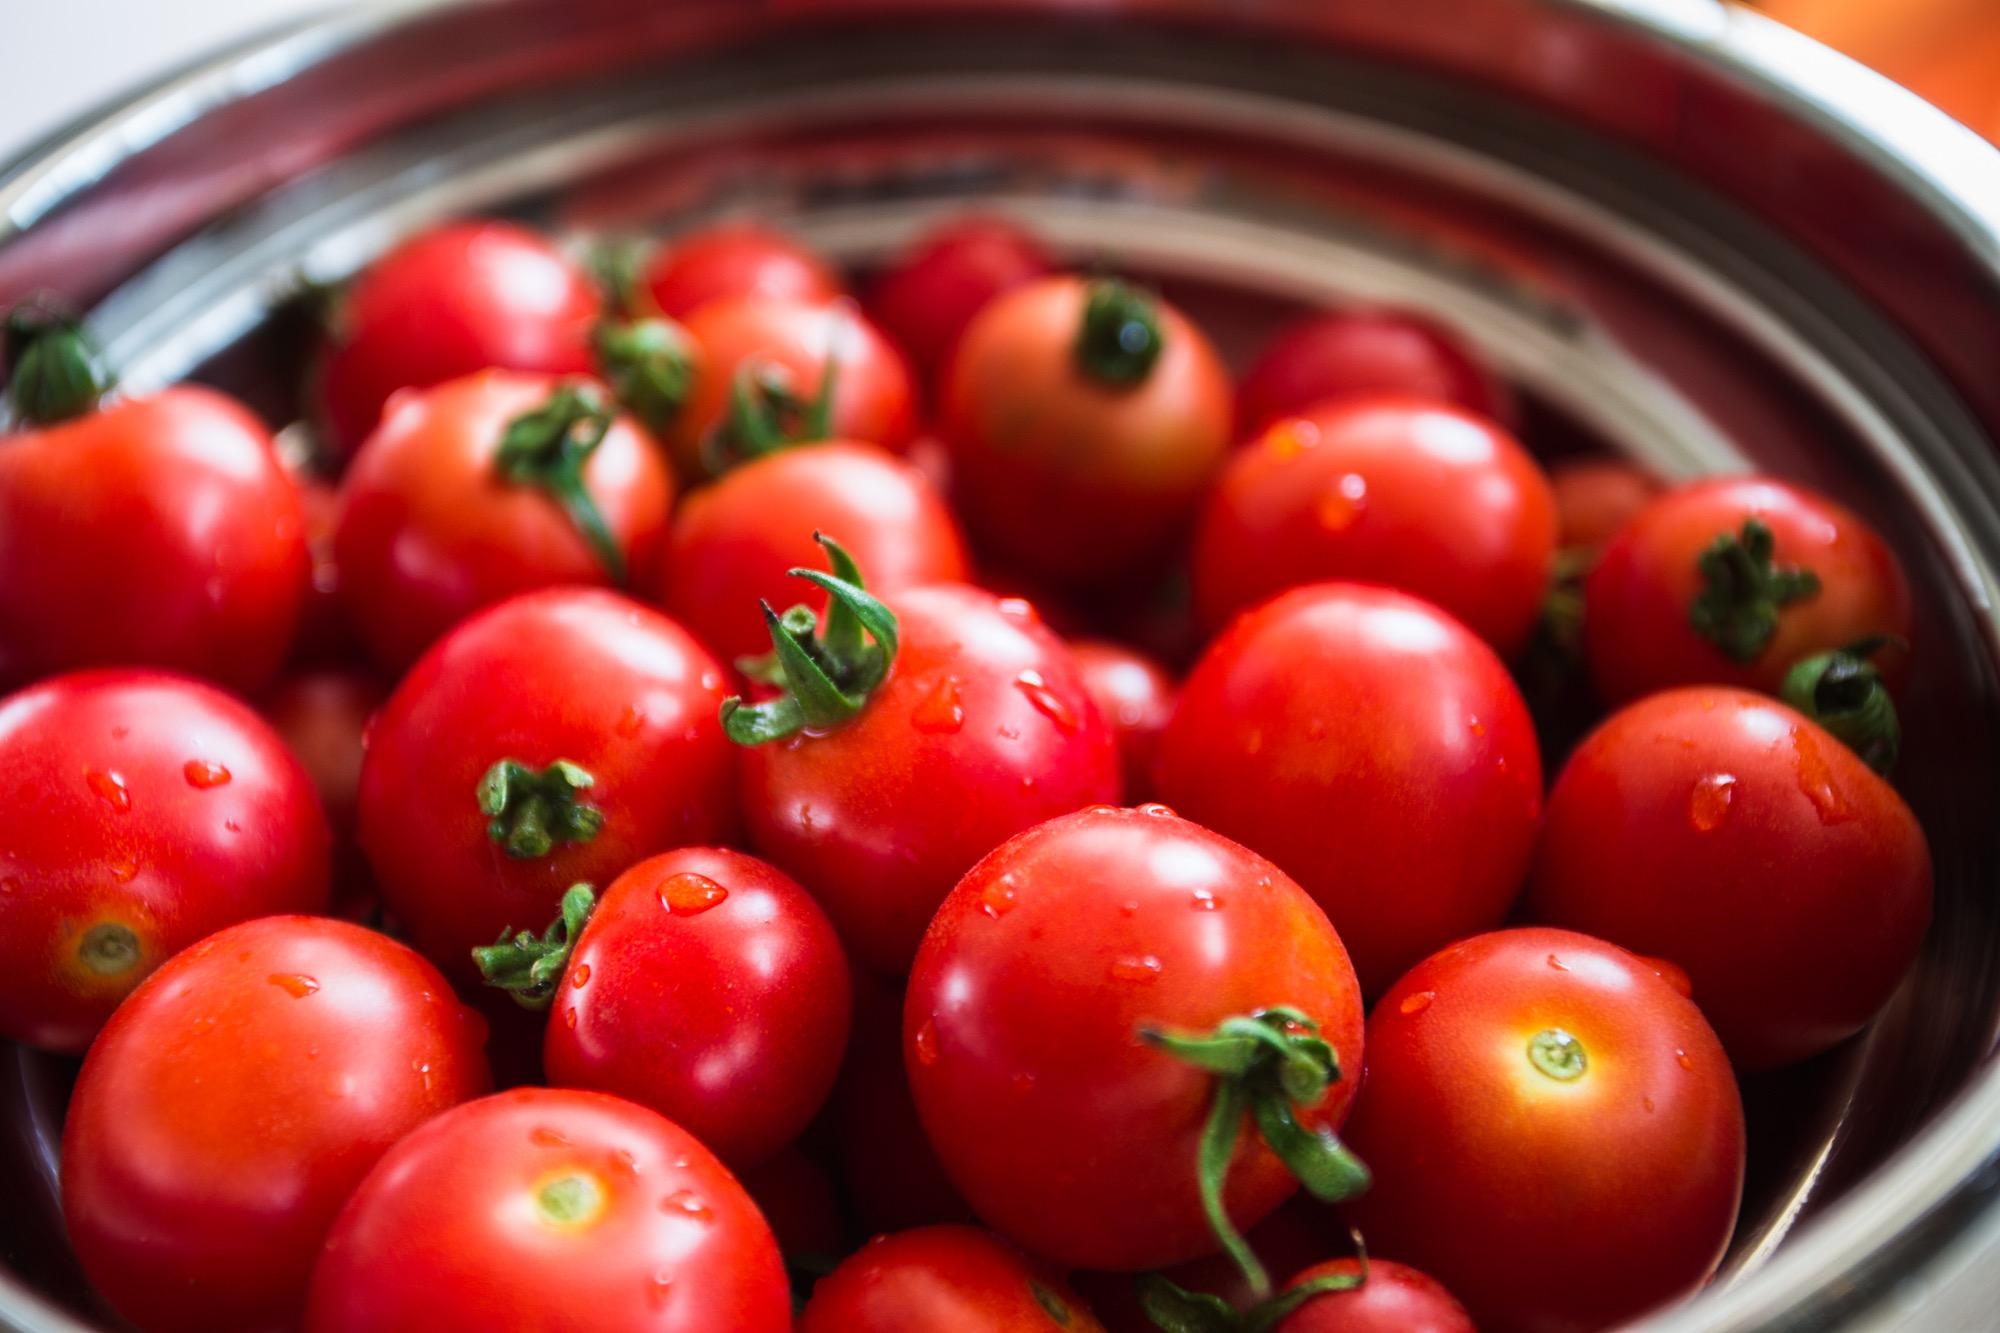 Ipersimply è tornato: scoprite le verdure e i frutti rossi